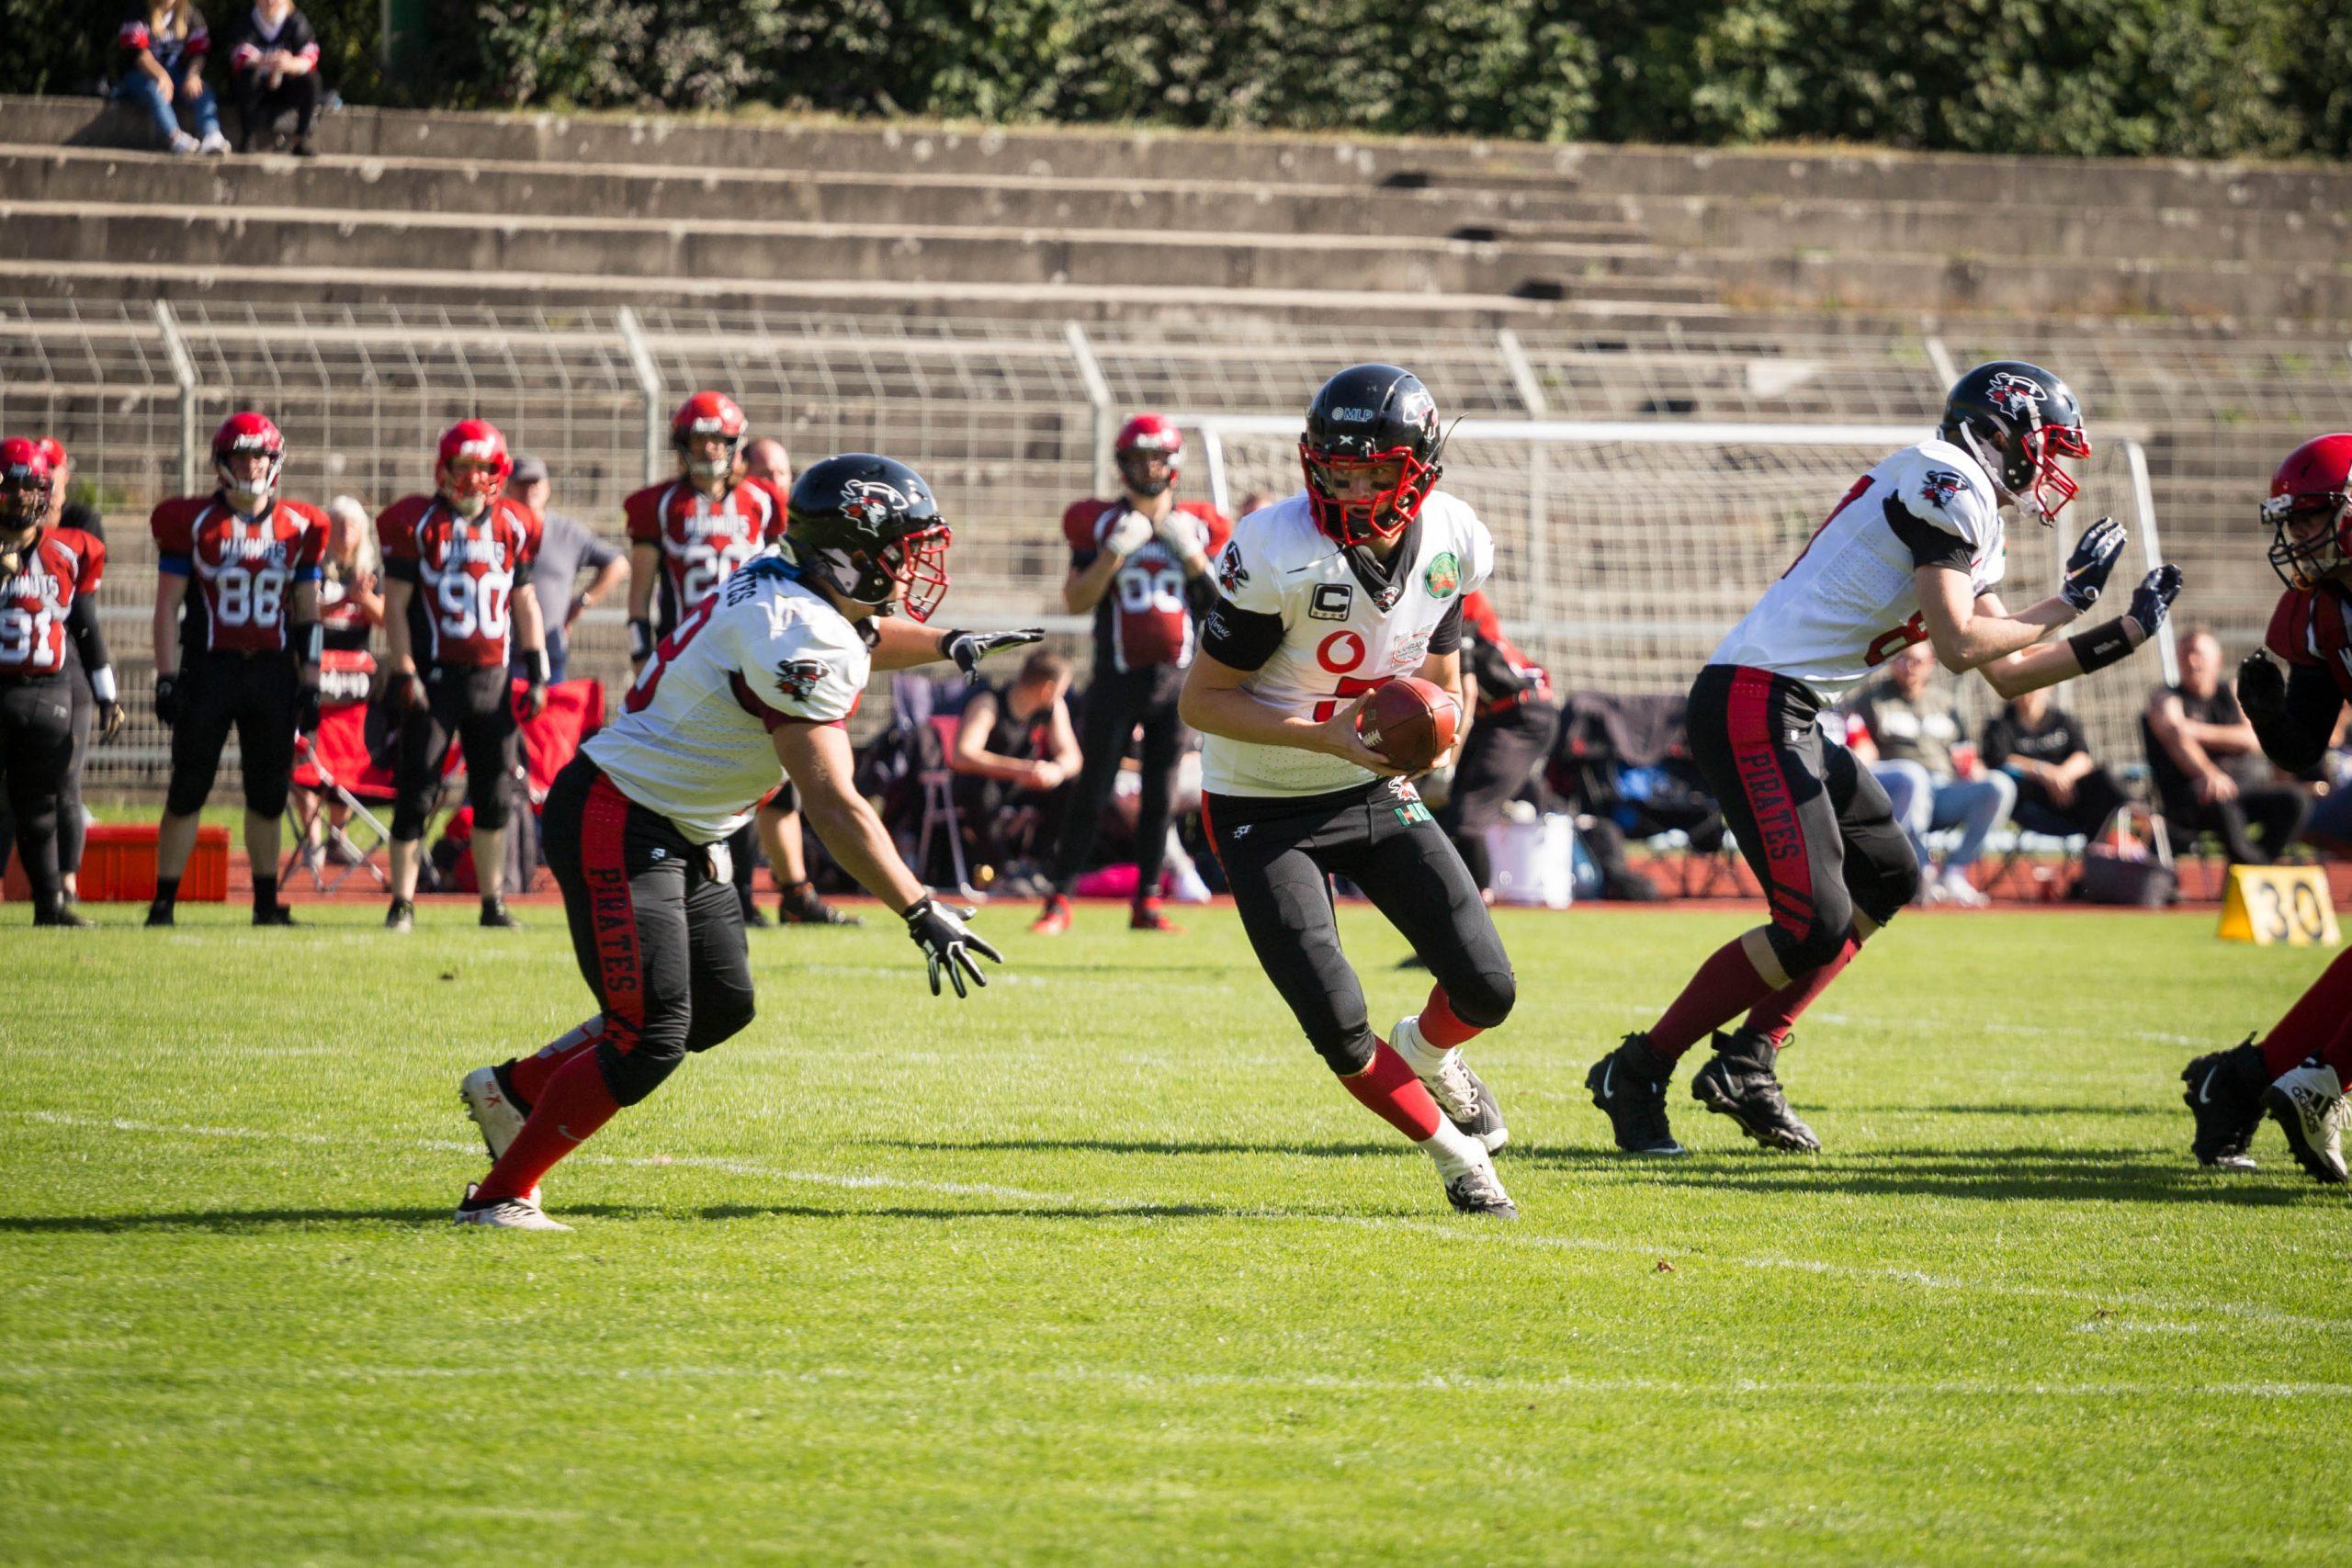 Konstanz Pirates - American Football - Kuchen IV